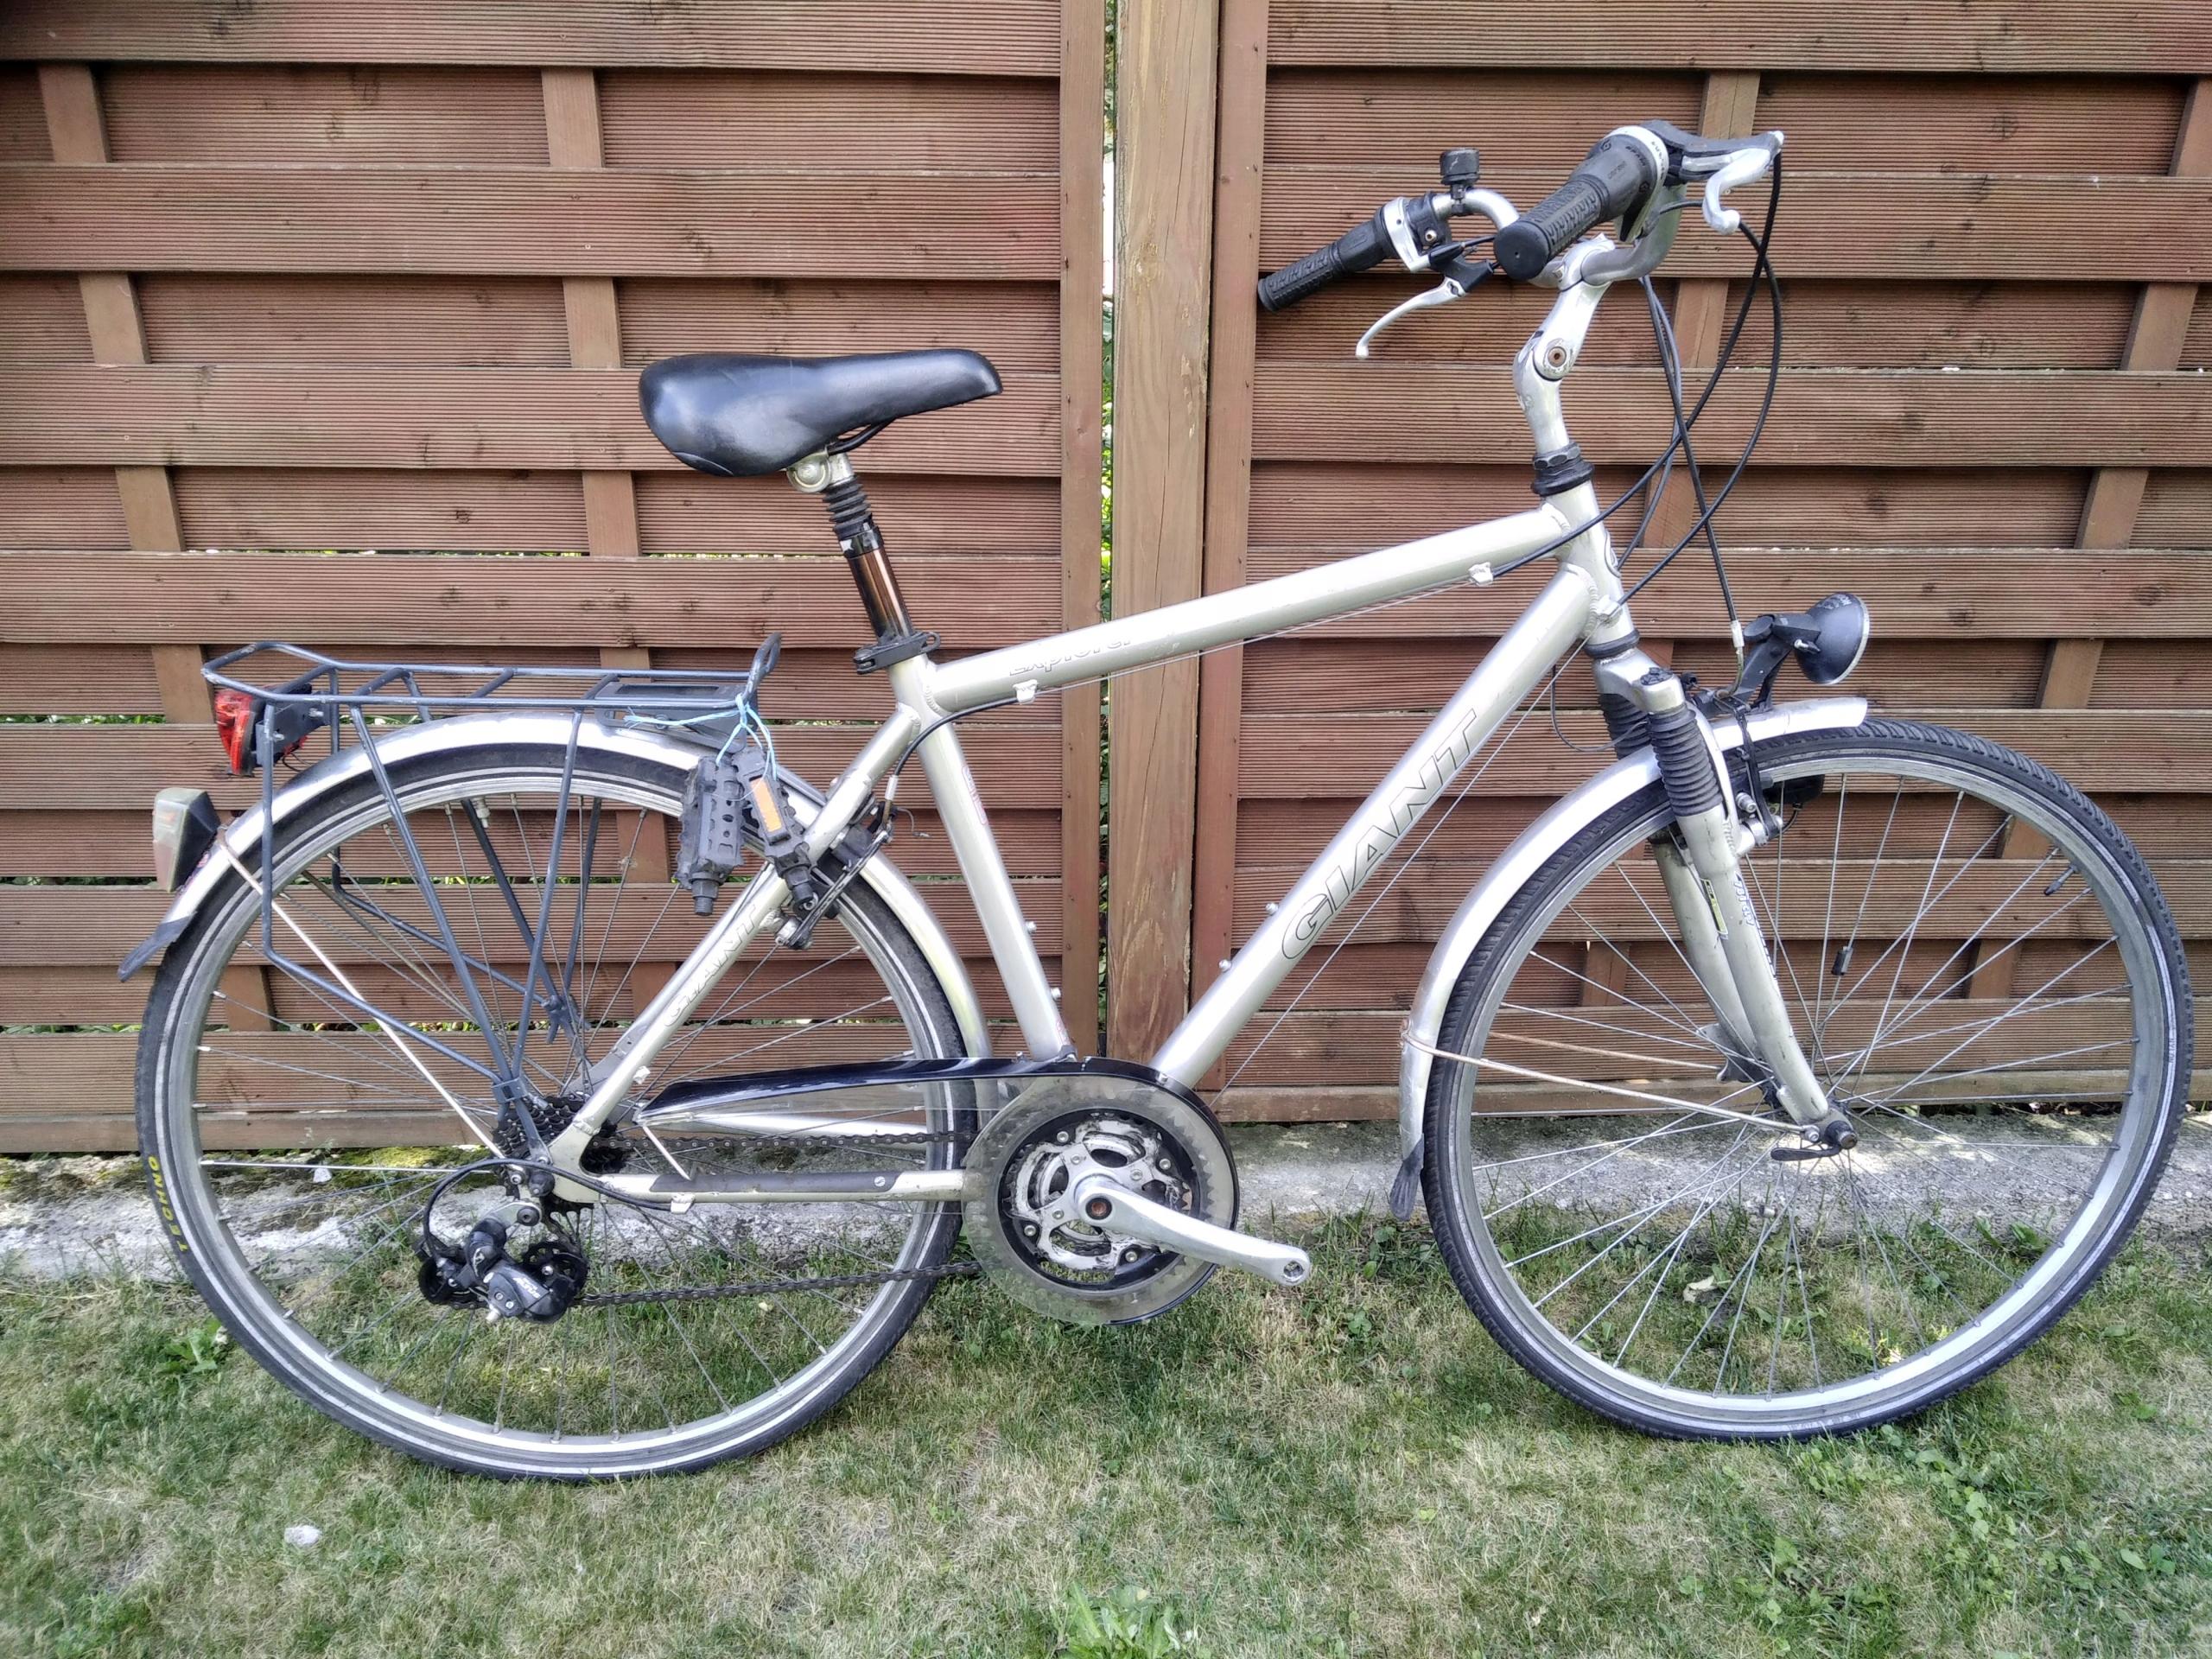 Aluminiowy rower Giant Explorer 28 cali